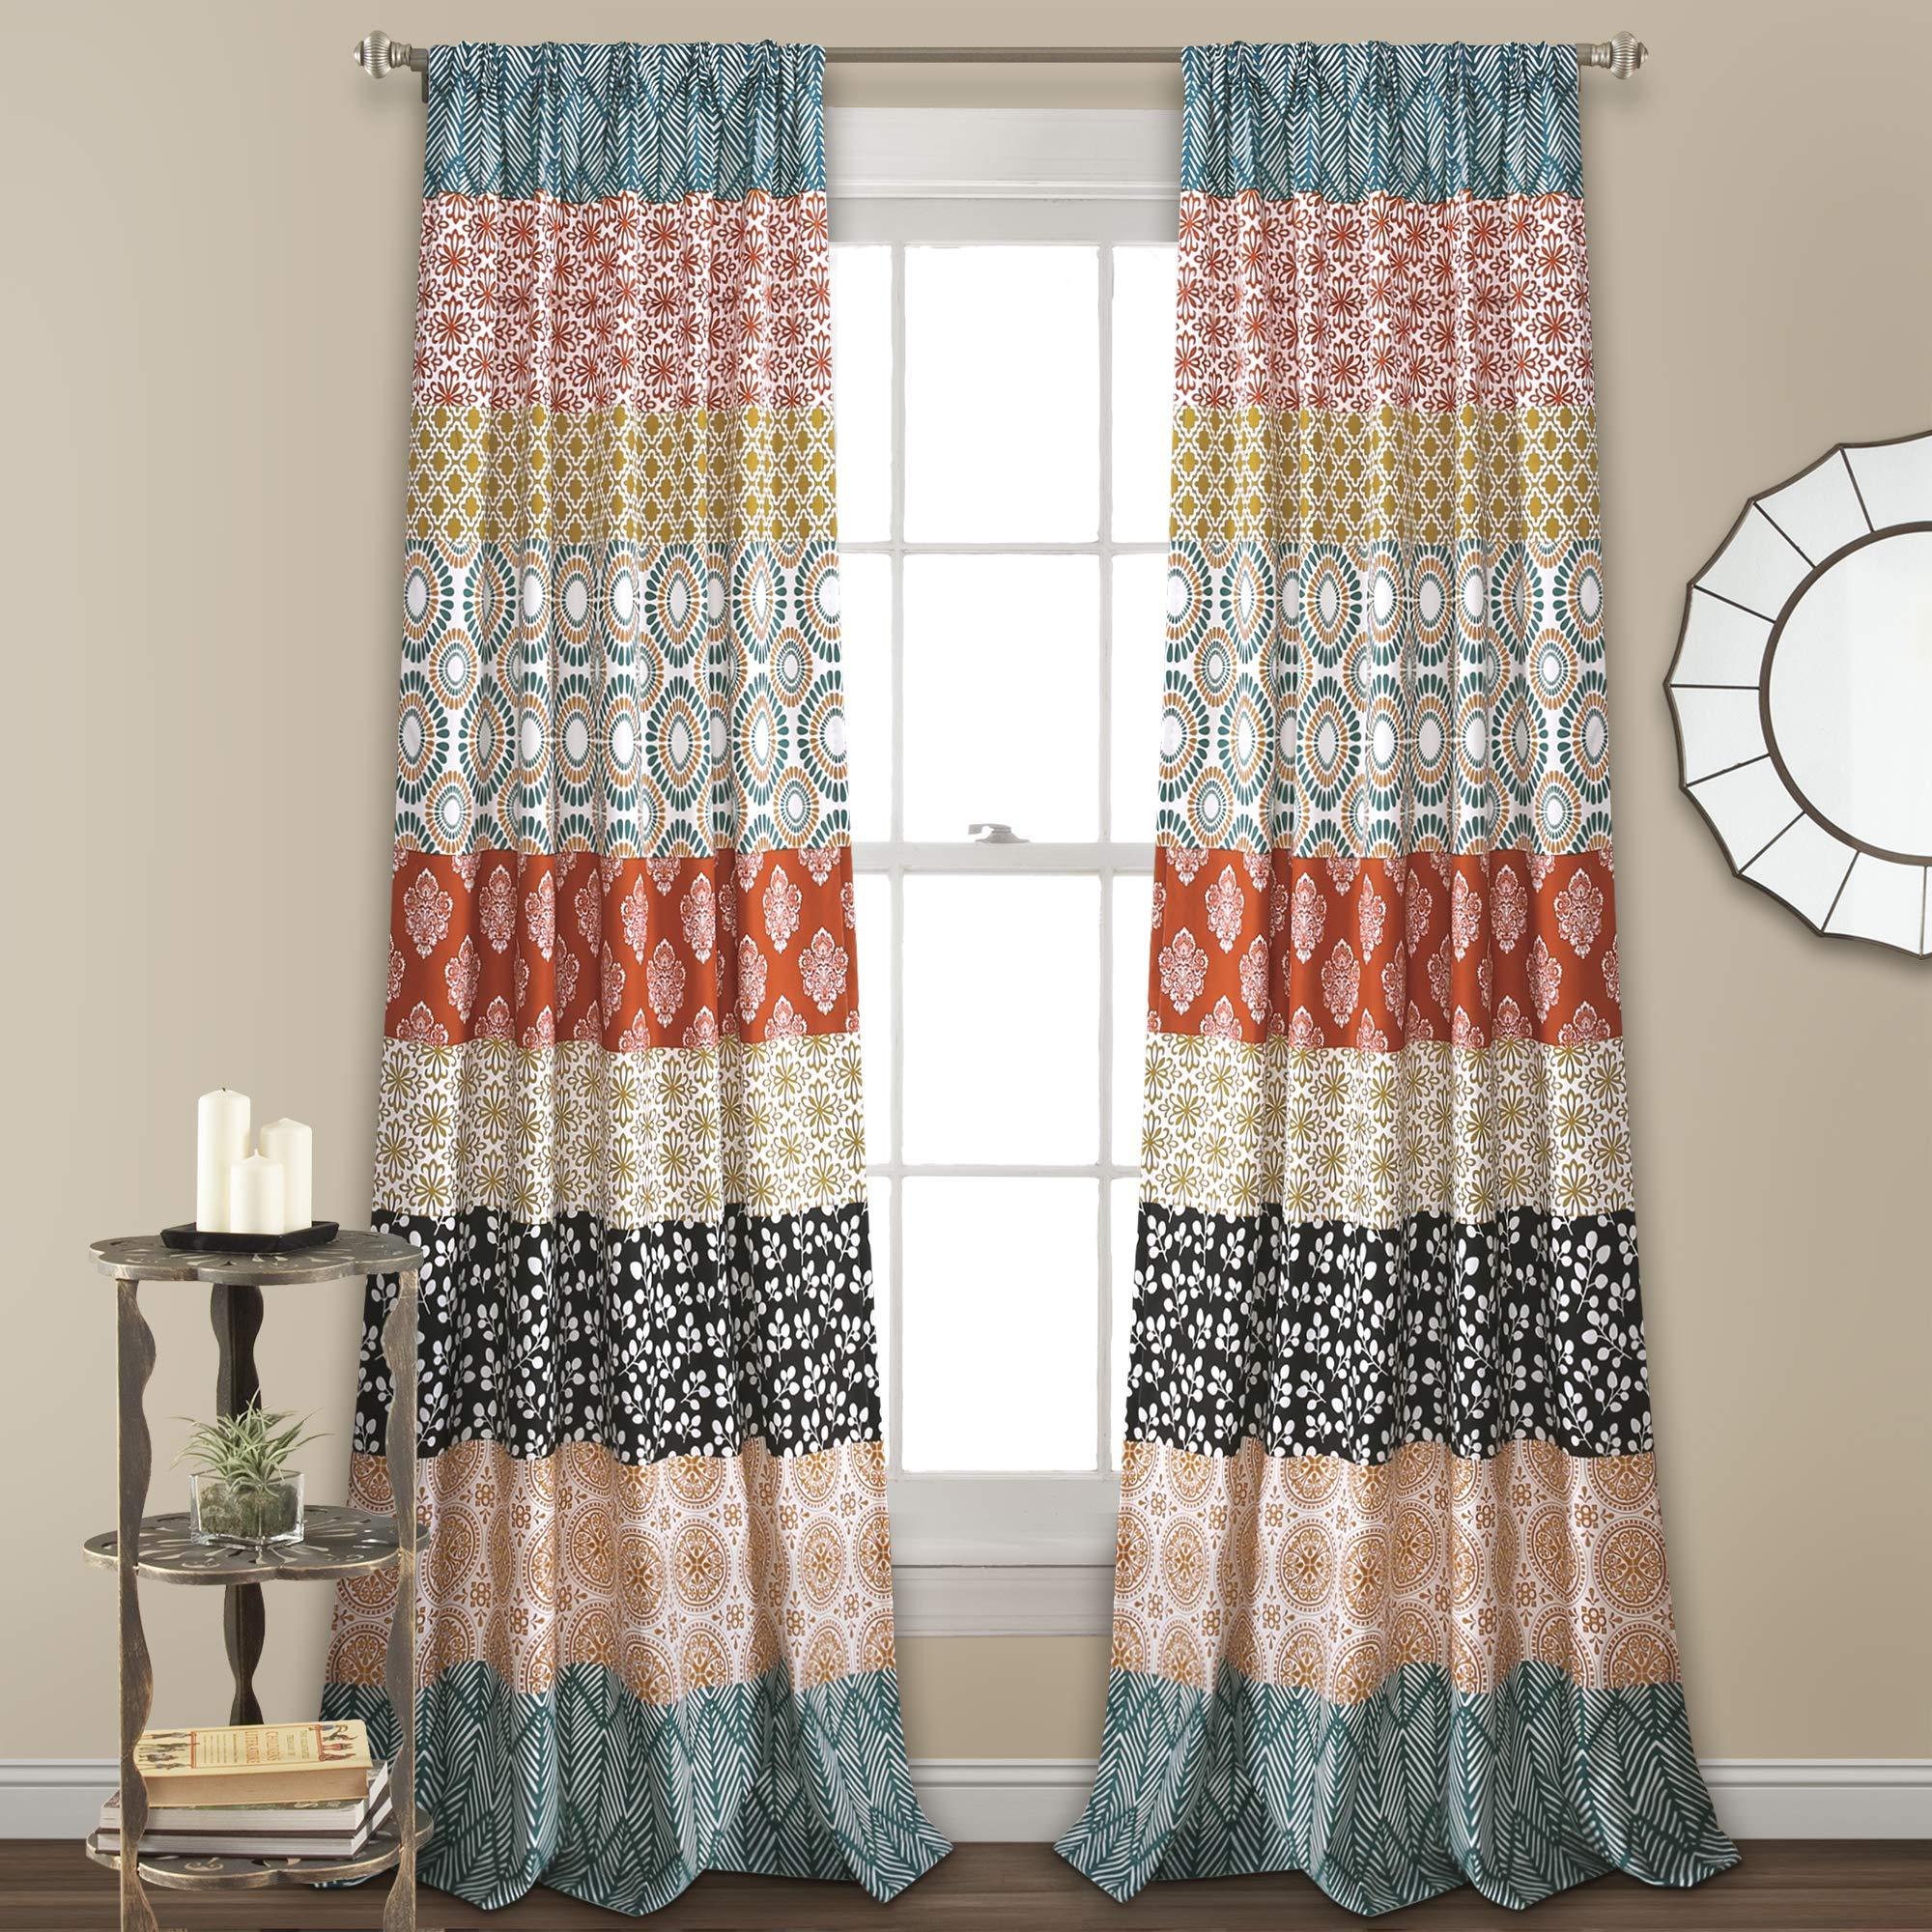 Lush Decor Bohemian Stripe Window Curtain Colorful Bold Design Panel Pair, 84'' x 52'', Turquoise and Orange by Lush Decor